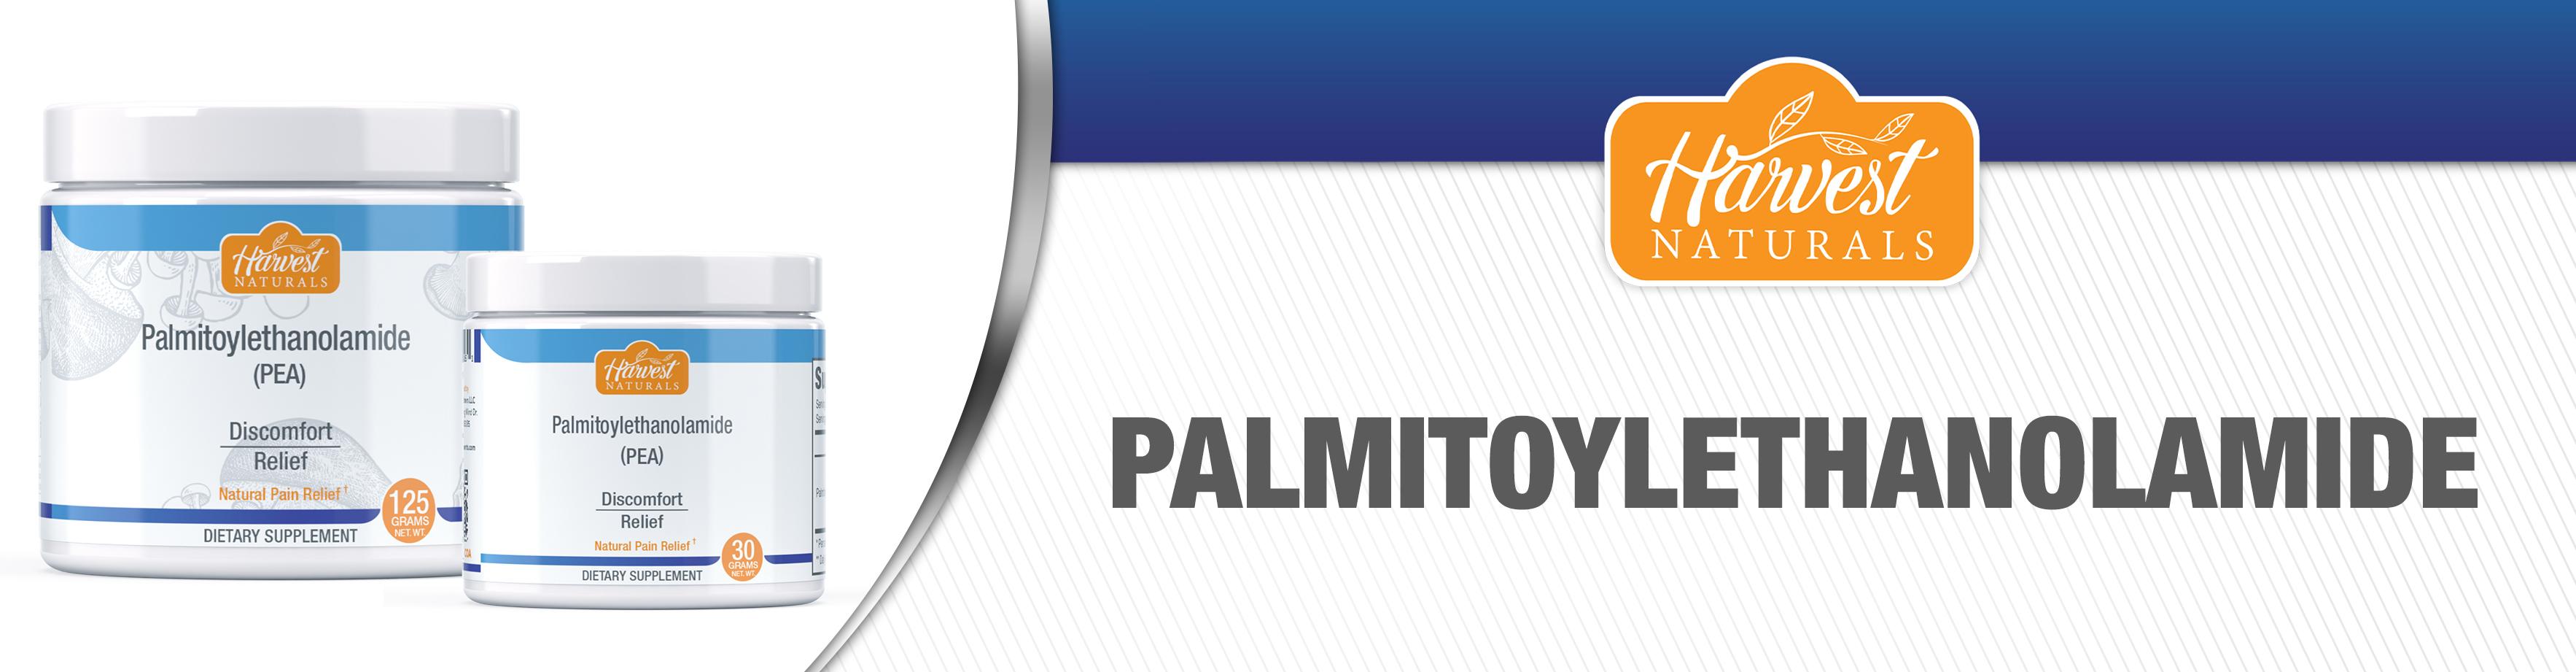 palmitoylethanolamide-powder-10-21.jpg